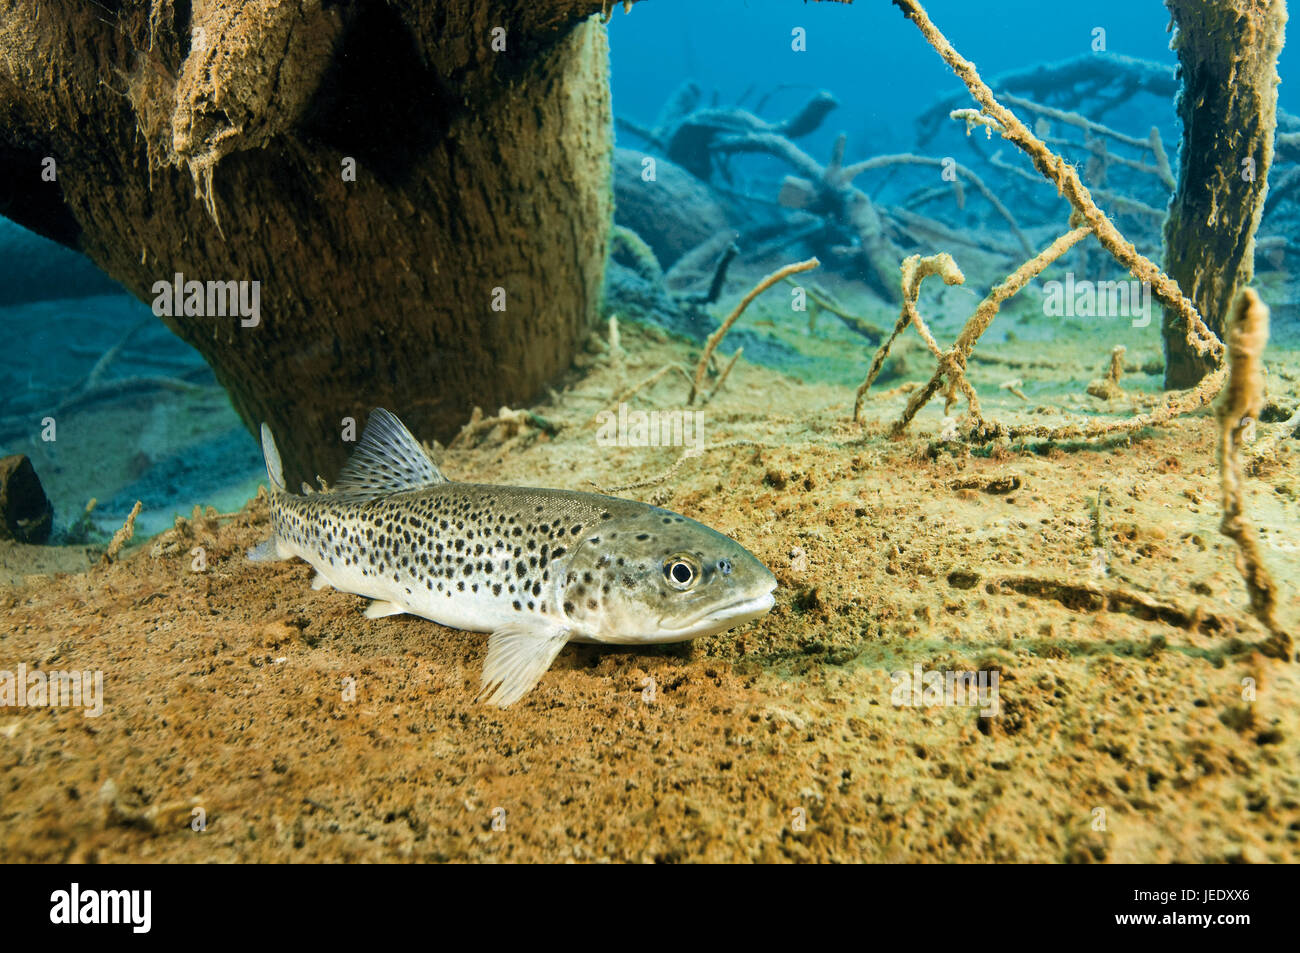 Seeforelle am Boden des Blindsees, Österreich; Tirol; Blindsee; Seeforelle; Forelle; Lachsfisch; Süsswasser - Stock Image